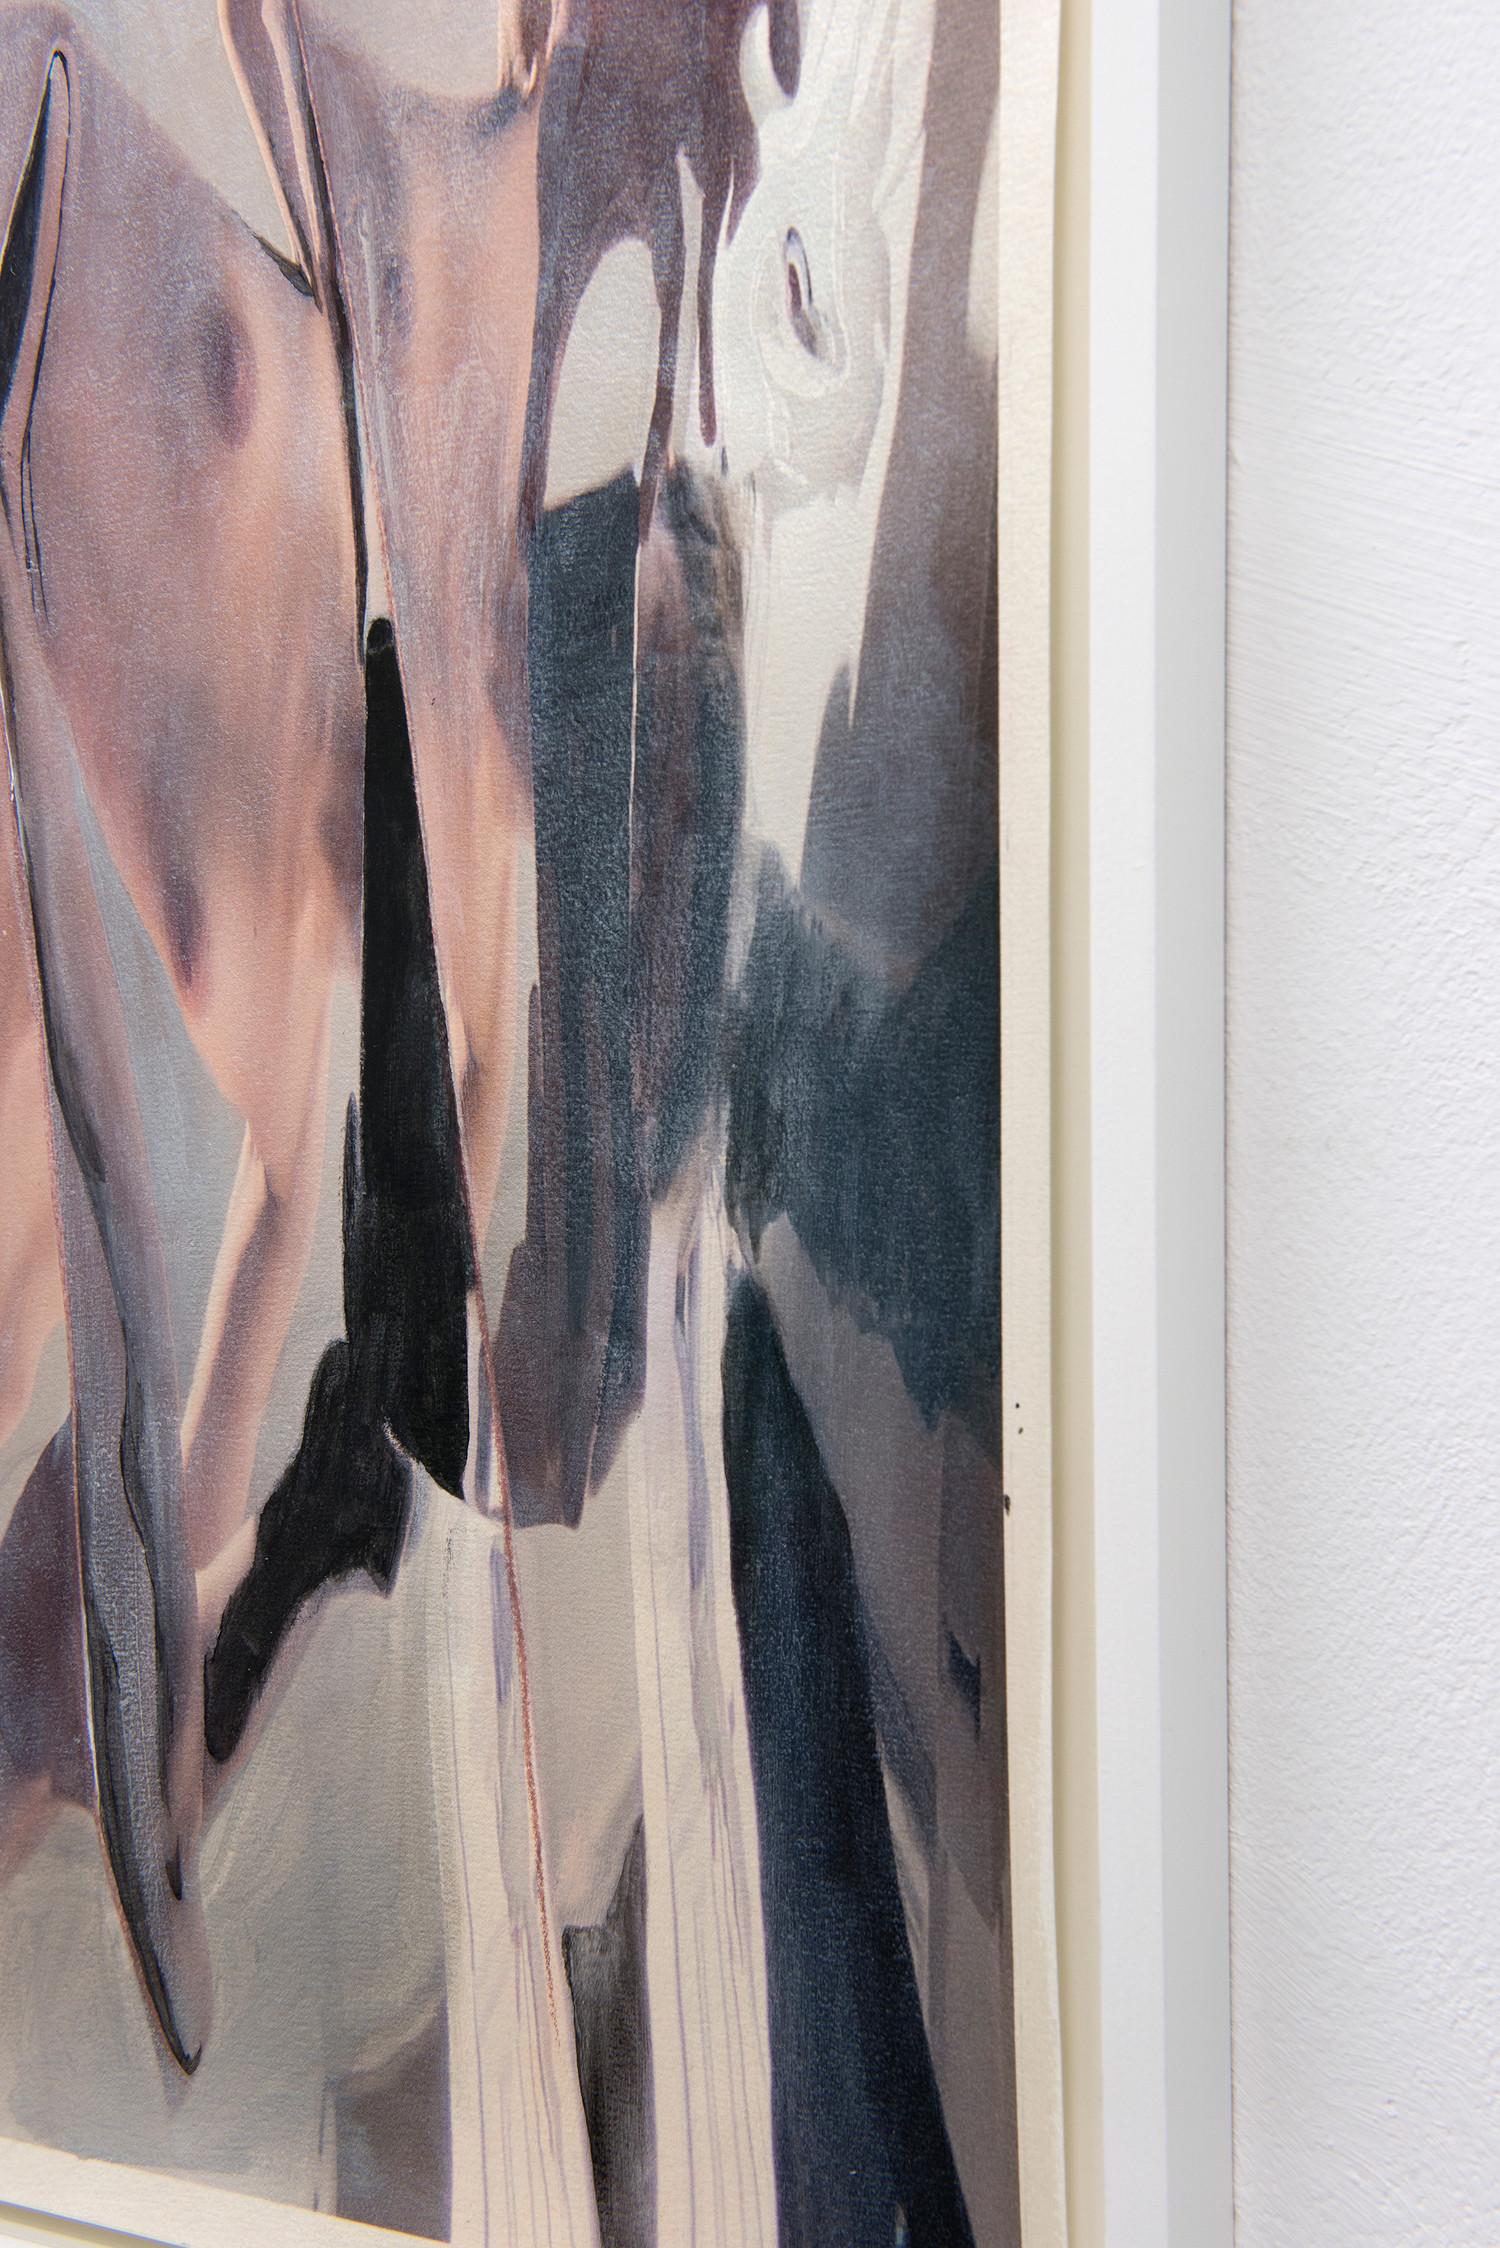 Self-portrait 1 (detail), 2020, ink, acrylic and pencil on paper, framed, each 75 x 55,5 x 3 cm — © Manon Wertenbroek